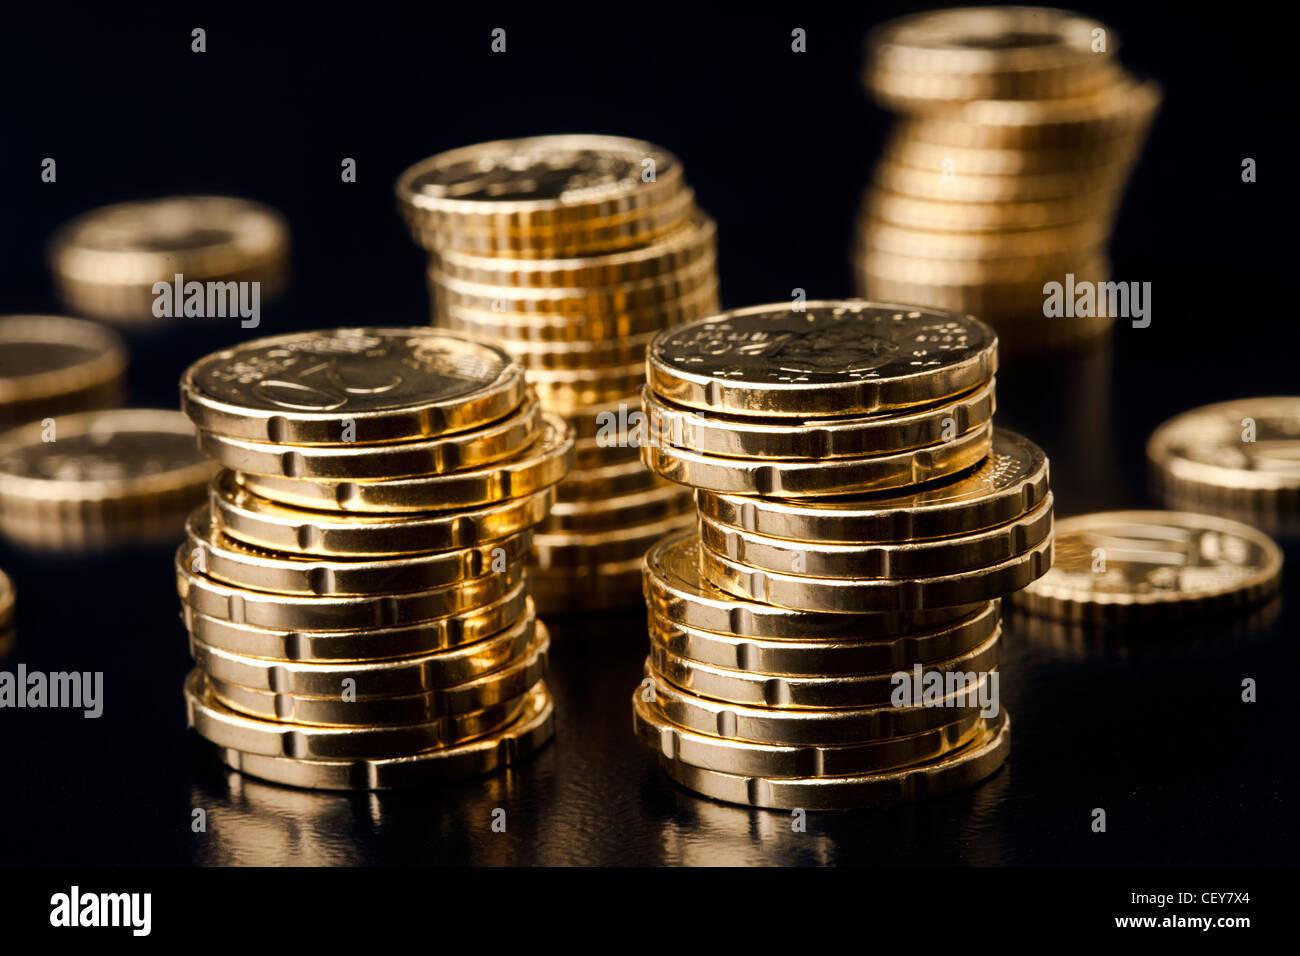 monedas de oro Imagen De Stock